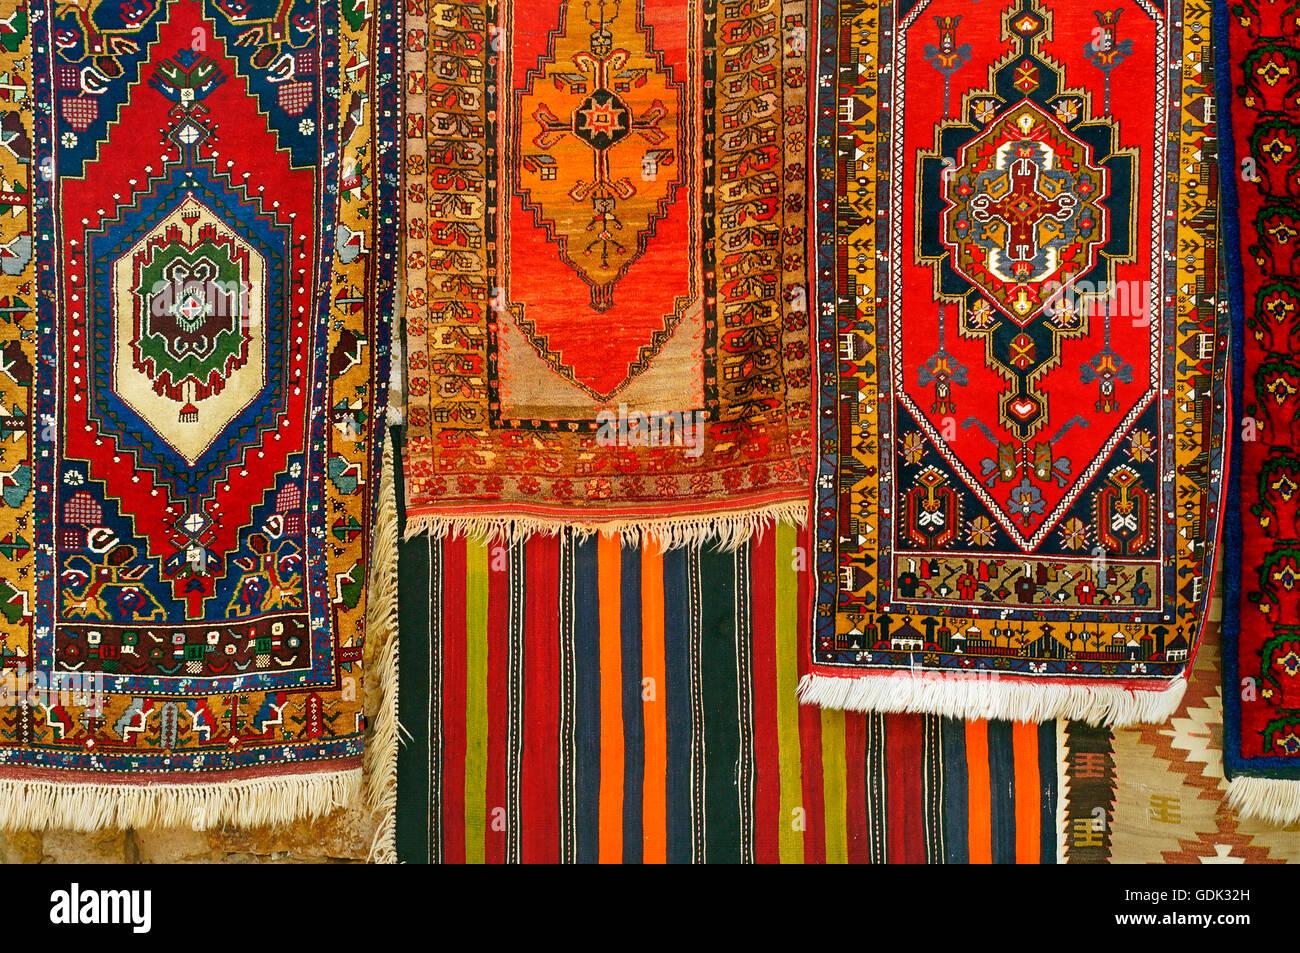 Tappeti Kilim Antichi : Kilim antichi e tappeti turchi cappadocia turchia la cappadocia